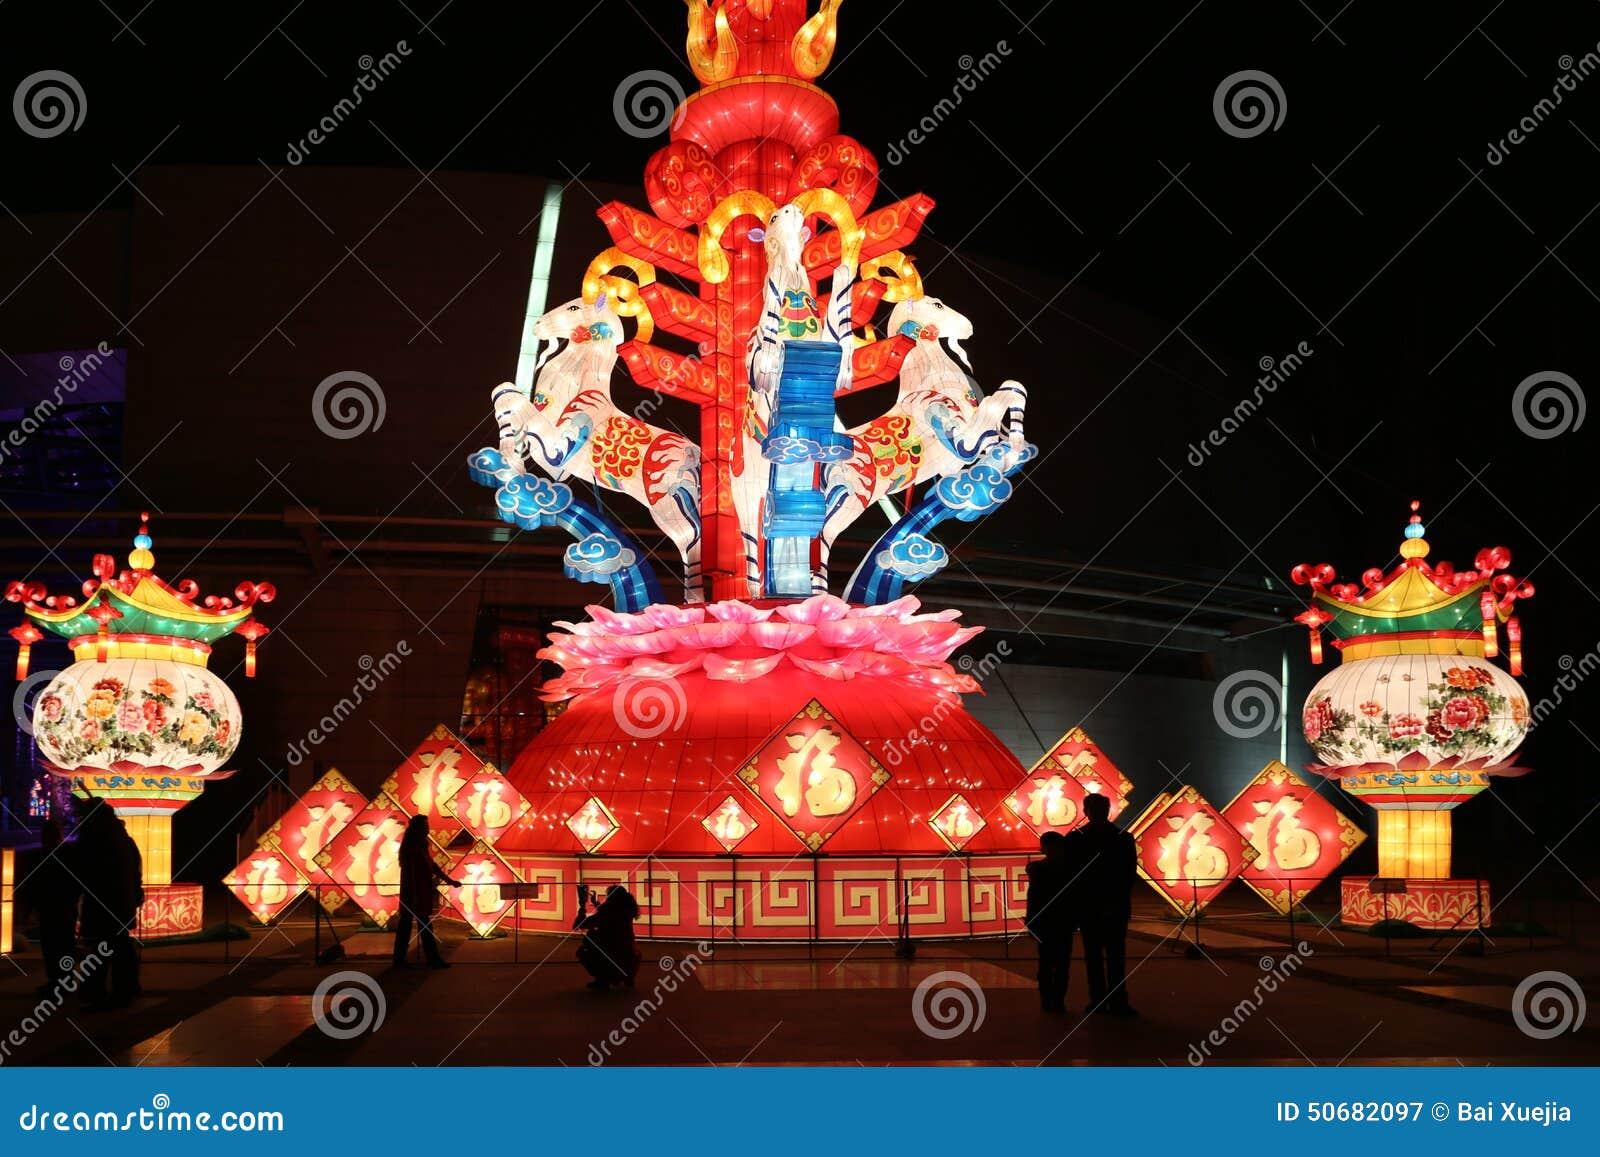 Download 灯会,成都,在2015年中国 图库摄影片. 图片 包括有 节日, 场面, 艺术, 名人, 成都, 灯笼, 春天 - 50682097